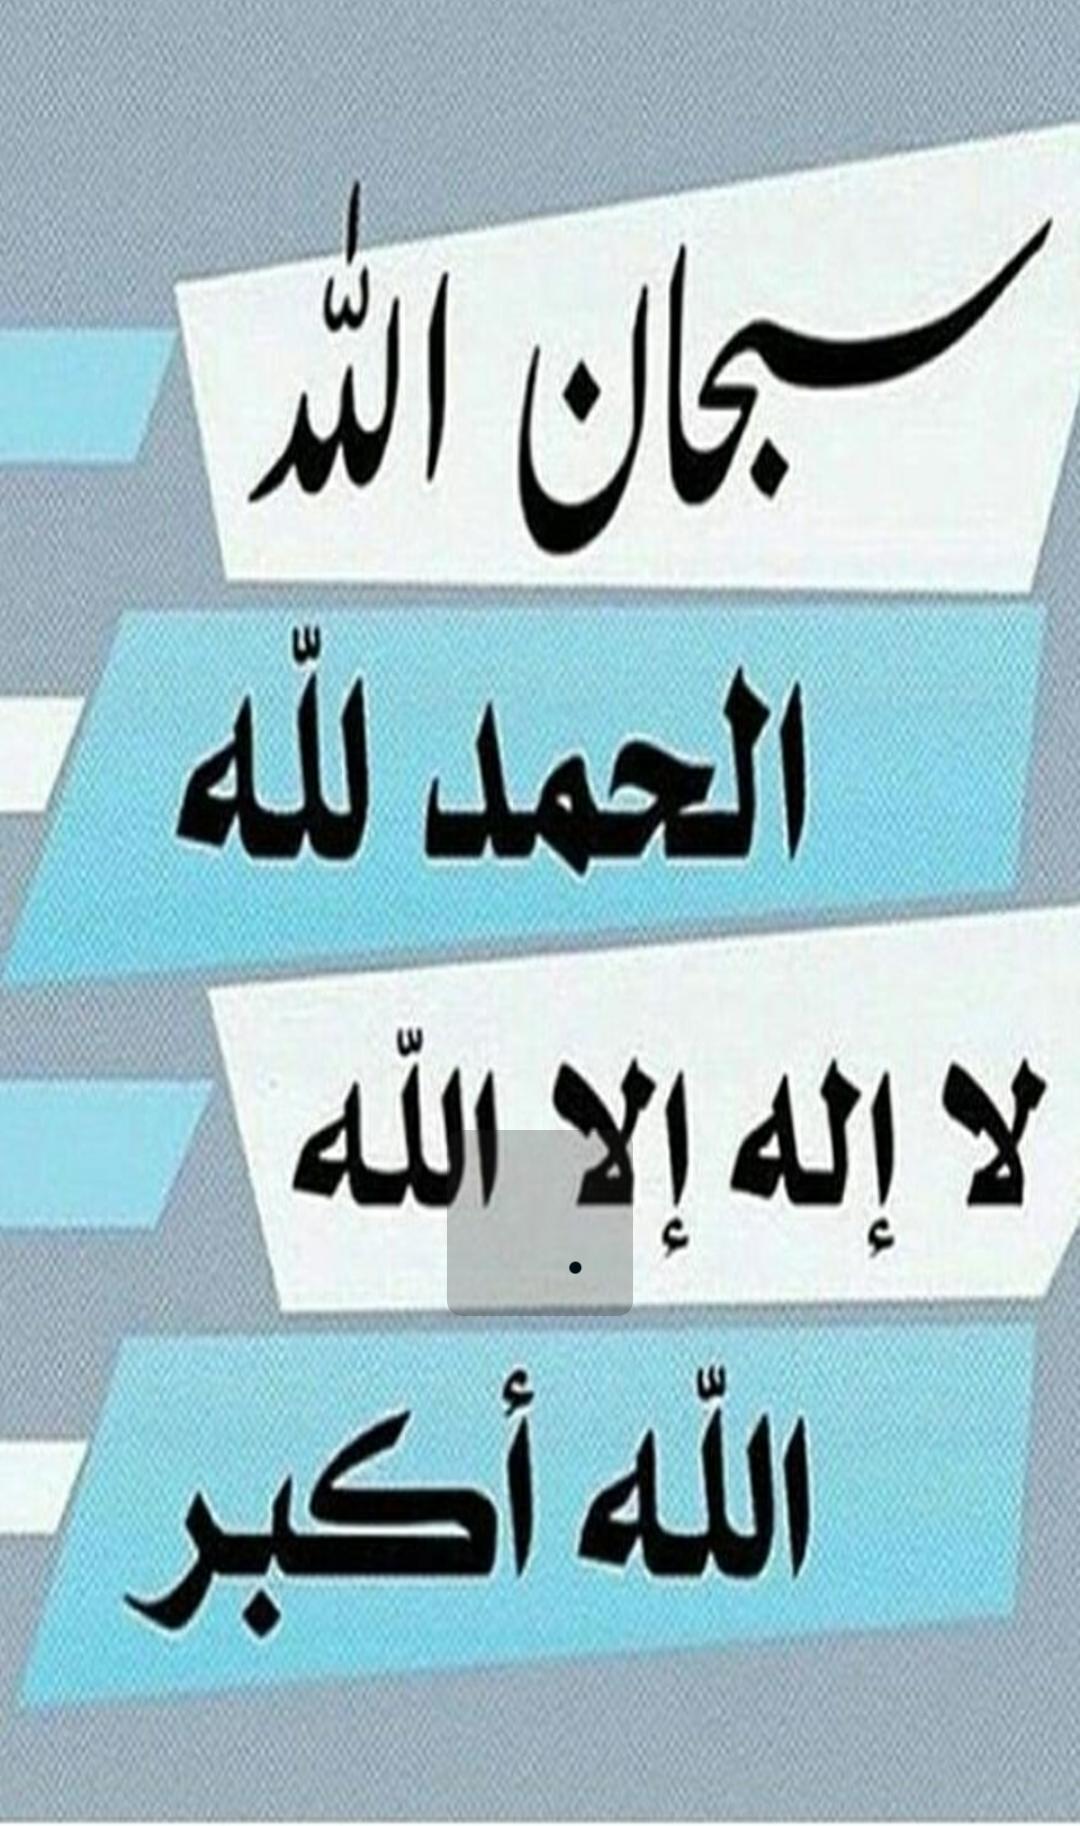 Pin By I Love You Iskander On Praise Allah ذكر الله Prayers Arabic Calligraphy Calligraphy